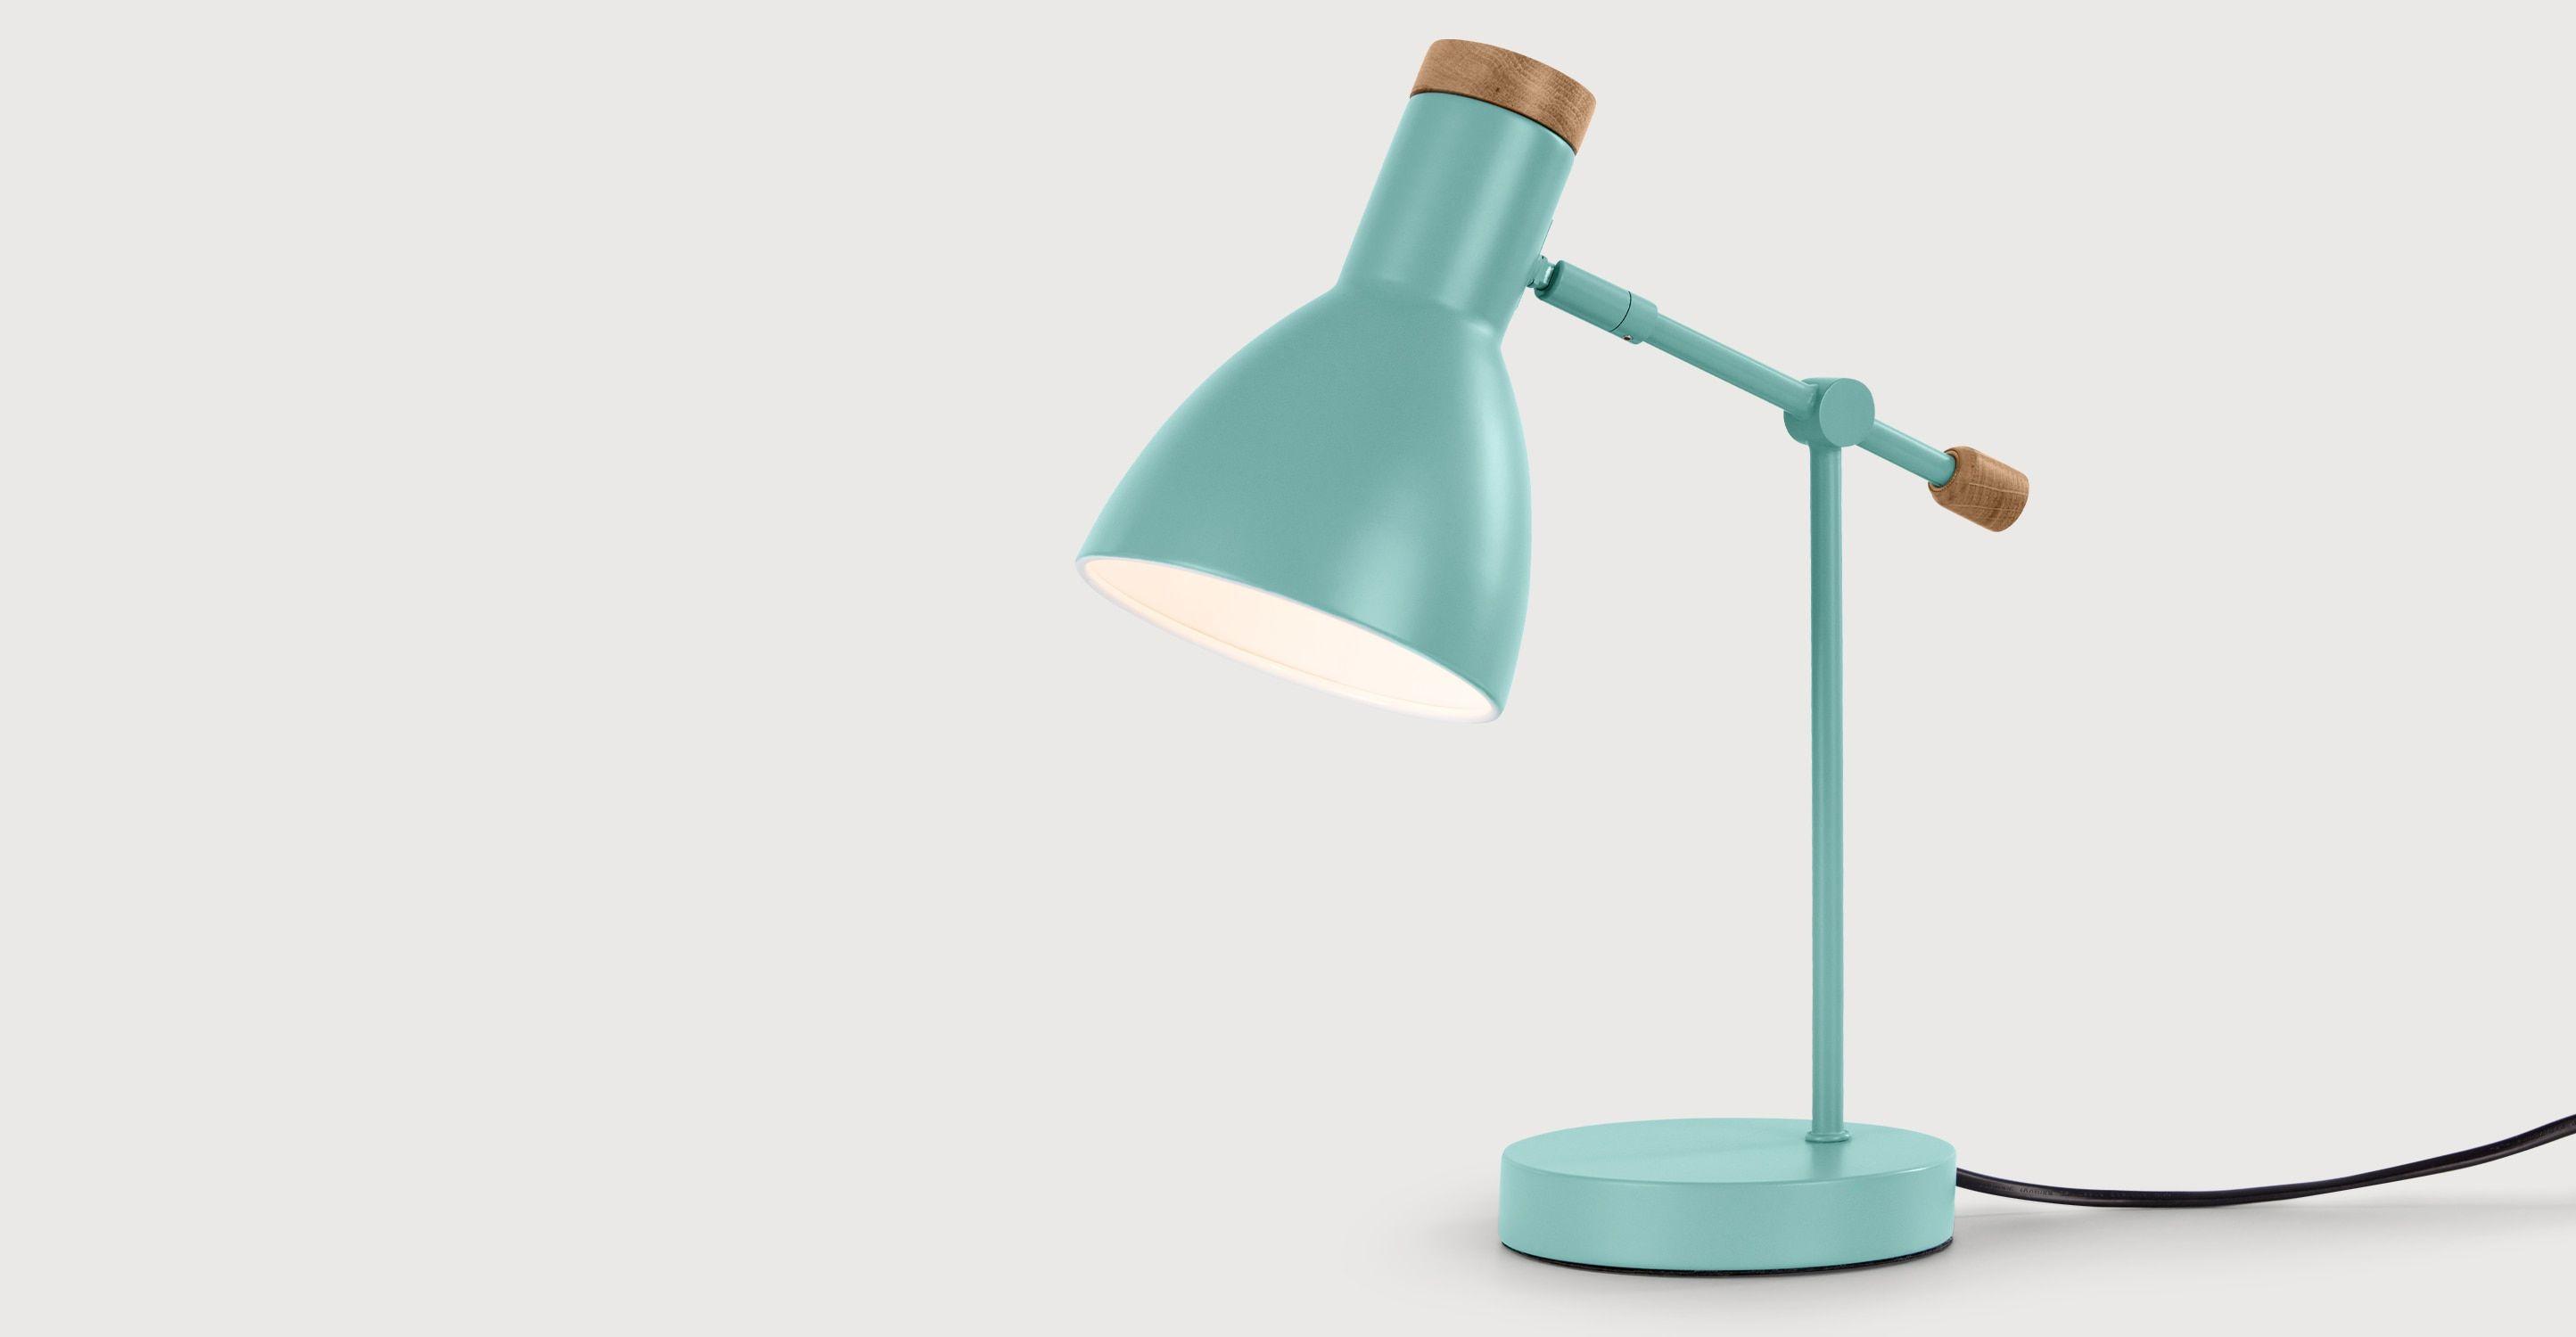 Cohen Une Lampe De Chevet Vert Et Chene Chevet Vert Et Chambres